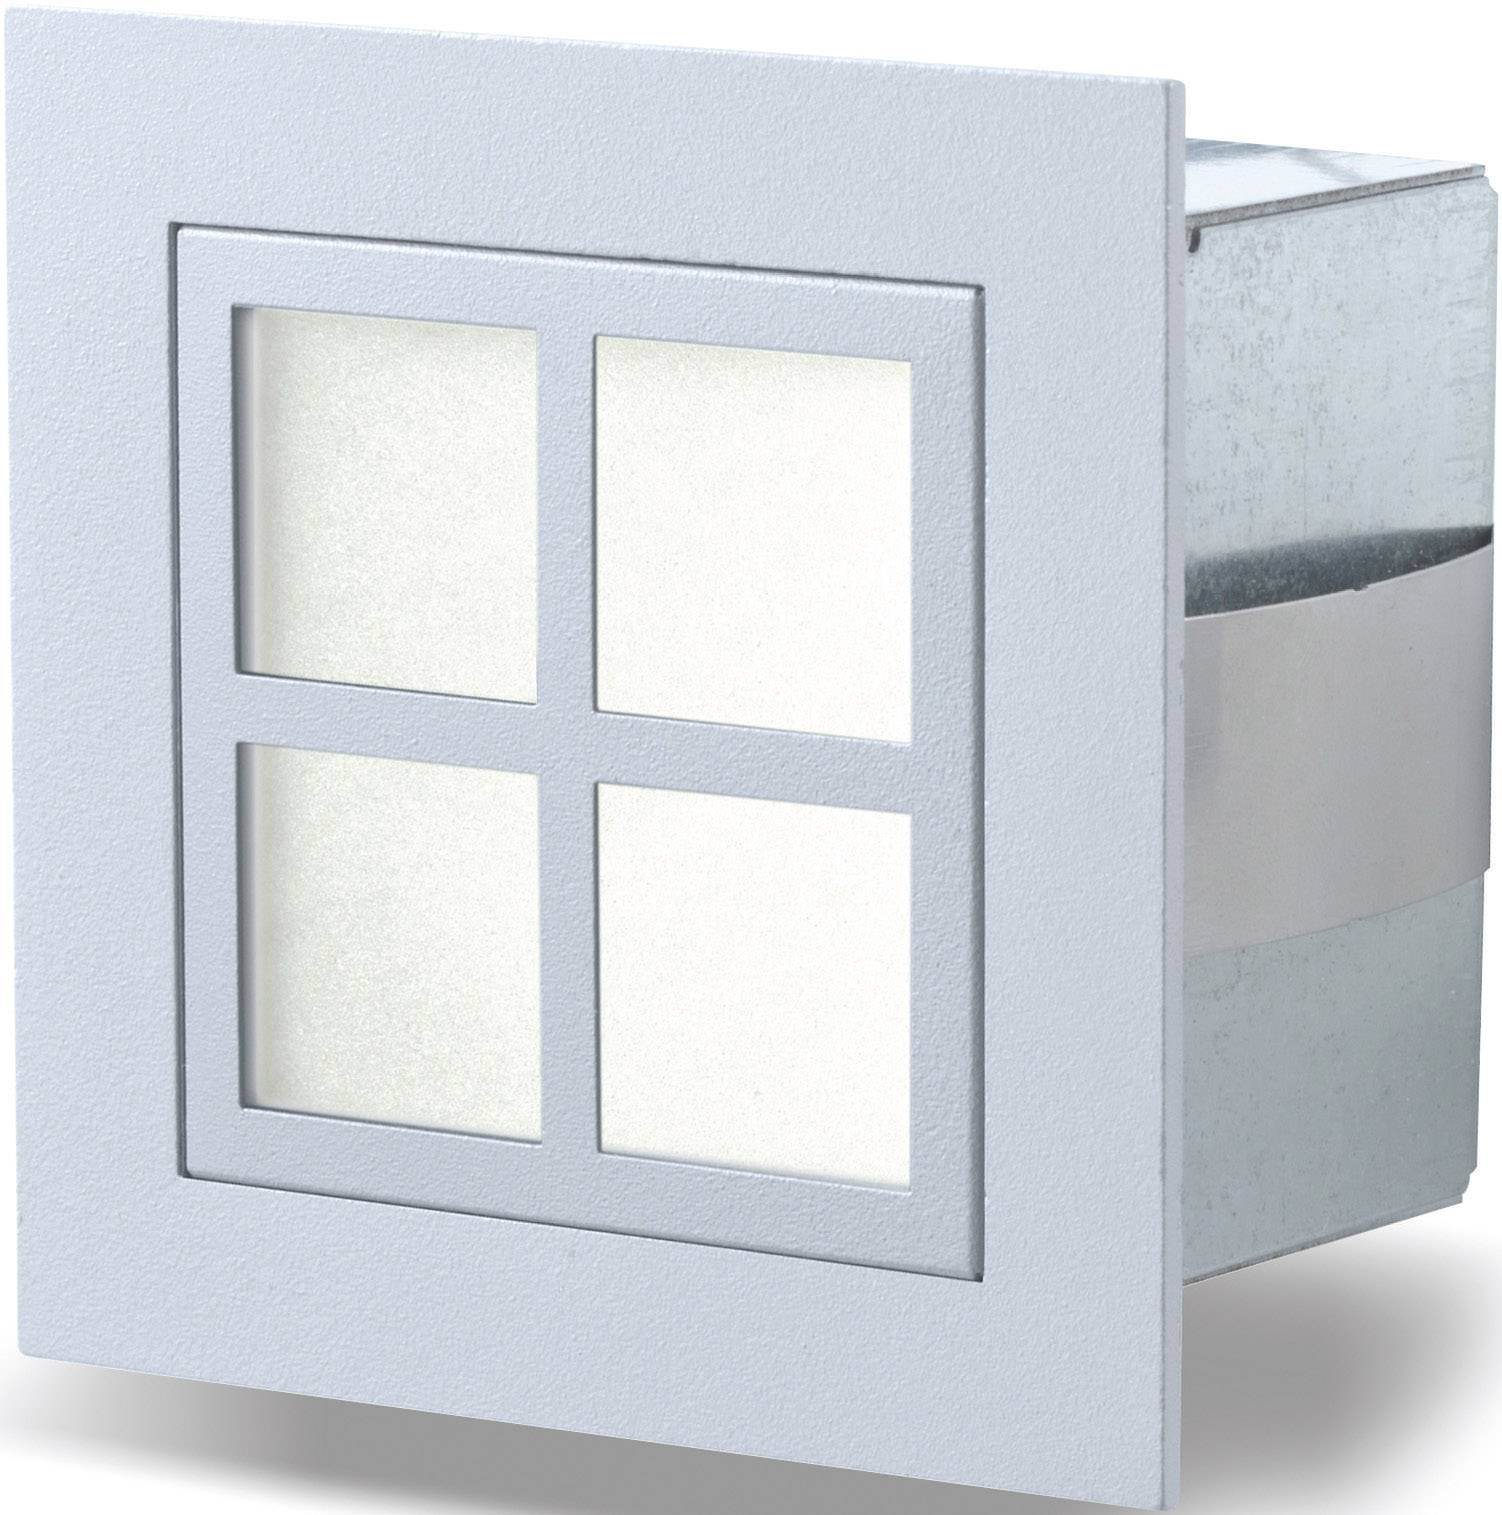 Vstavané LED svetlo Sygonix Marsala, 1 W, 350 mA